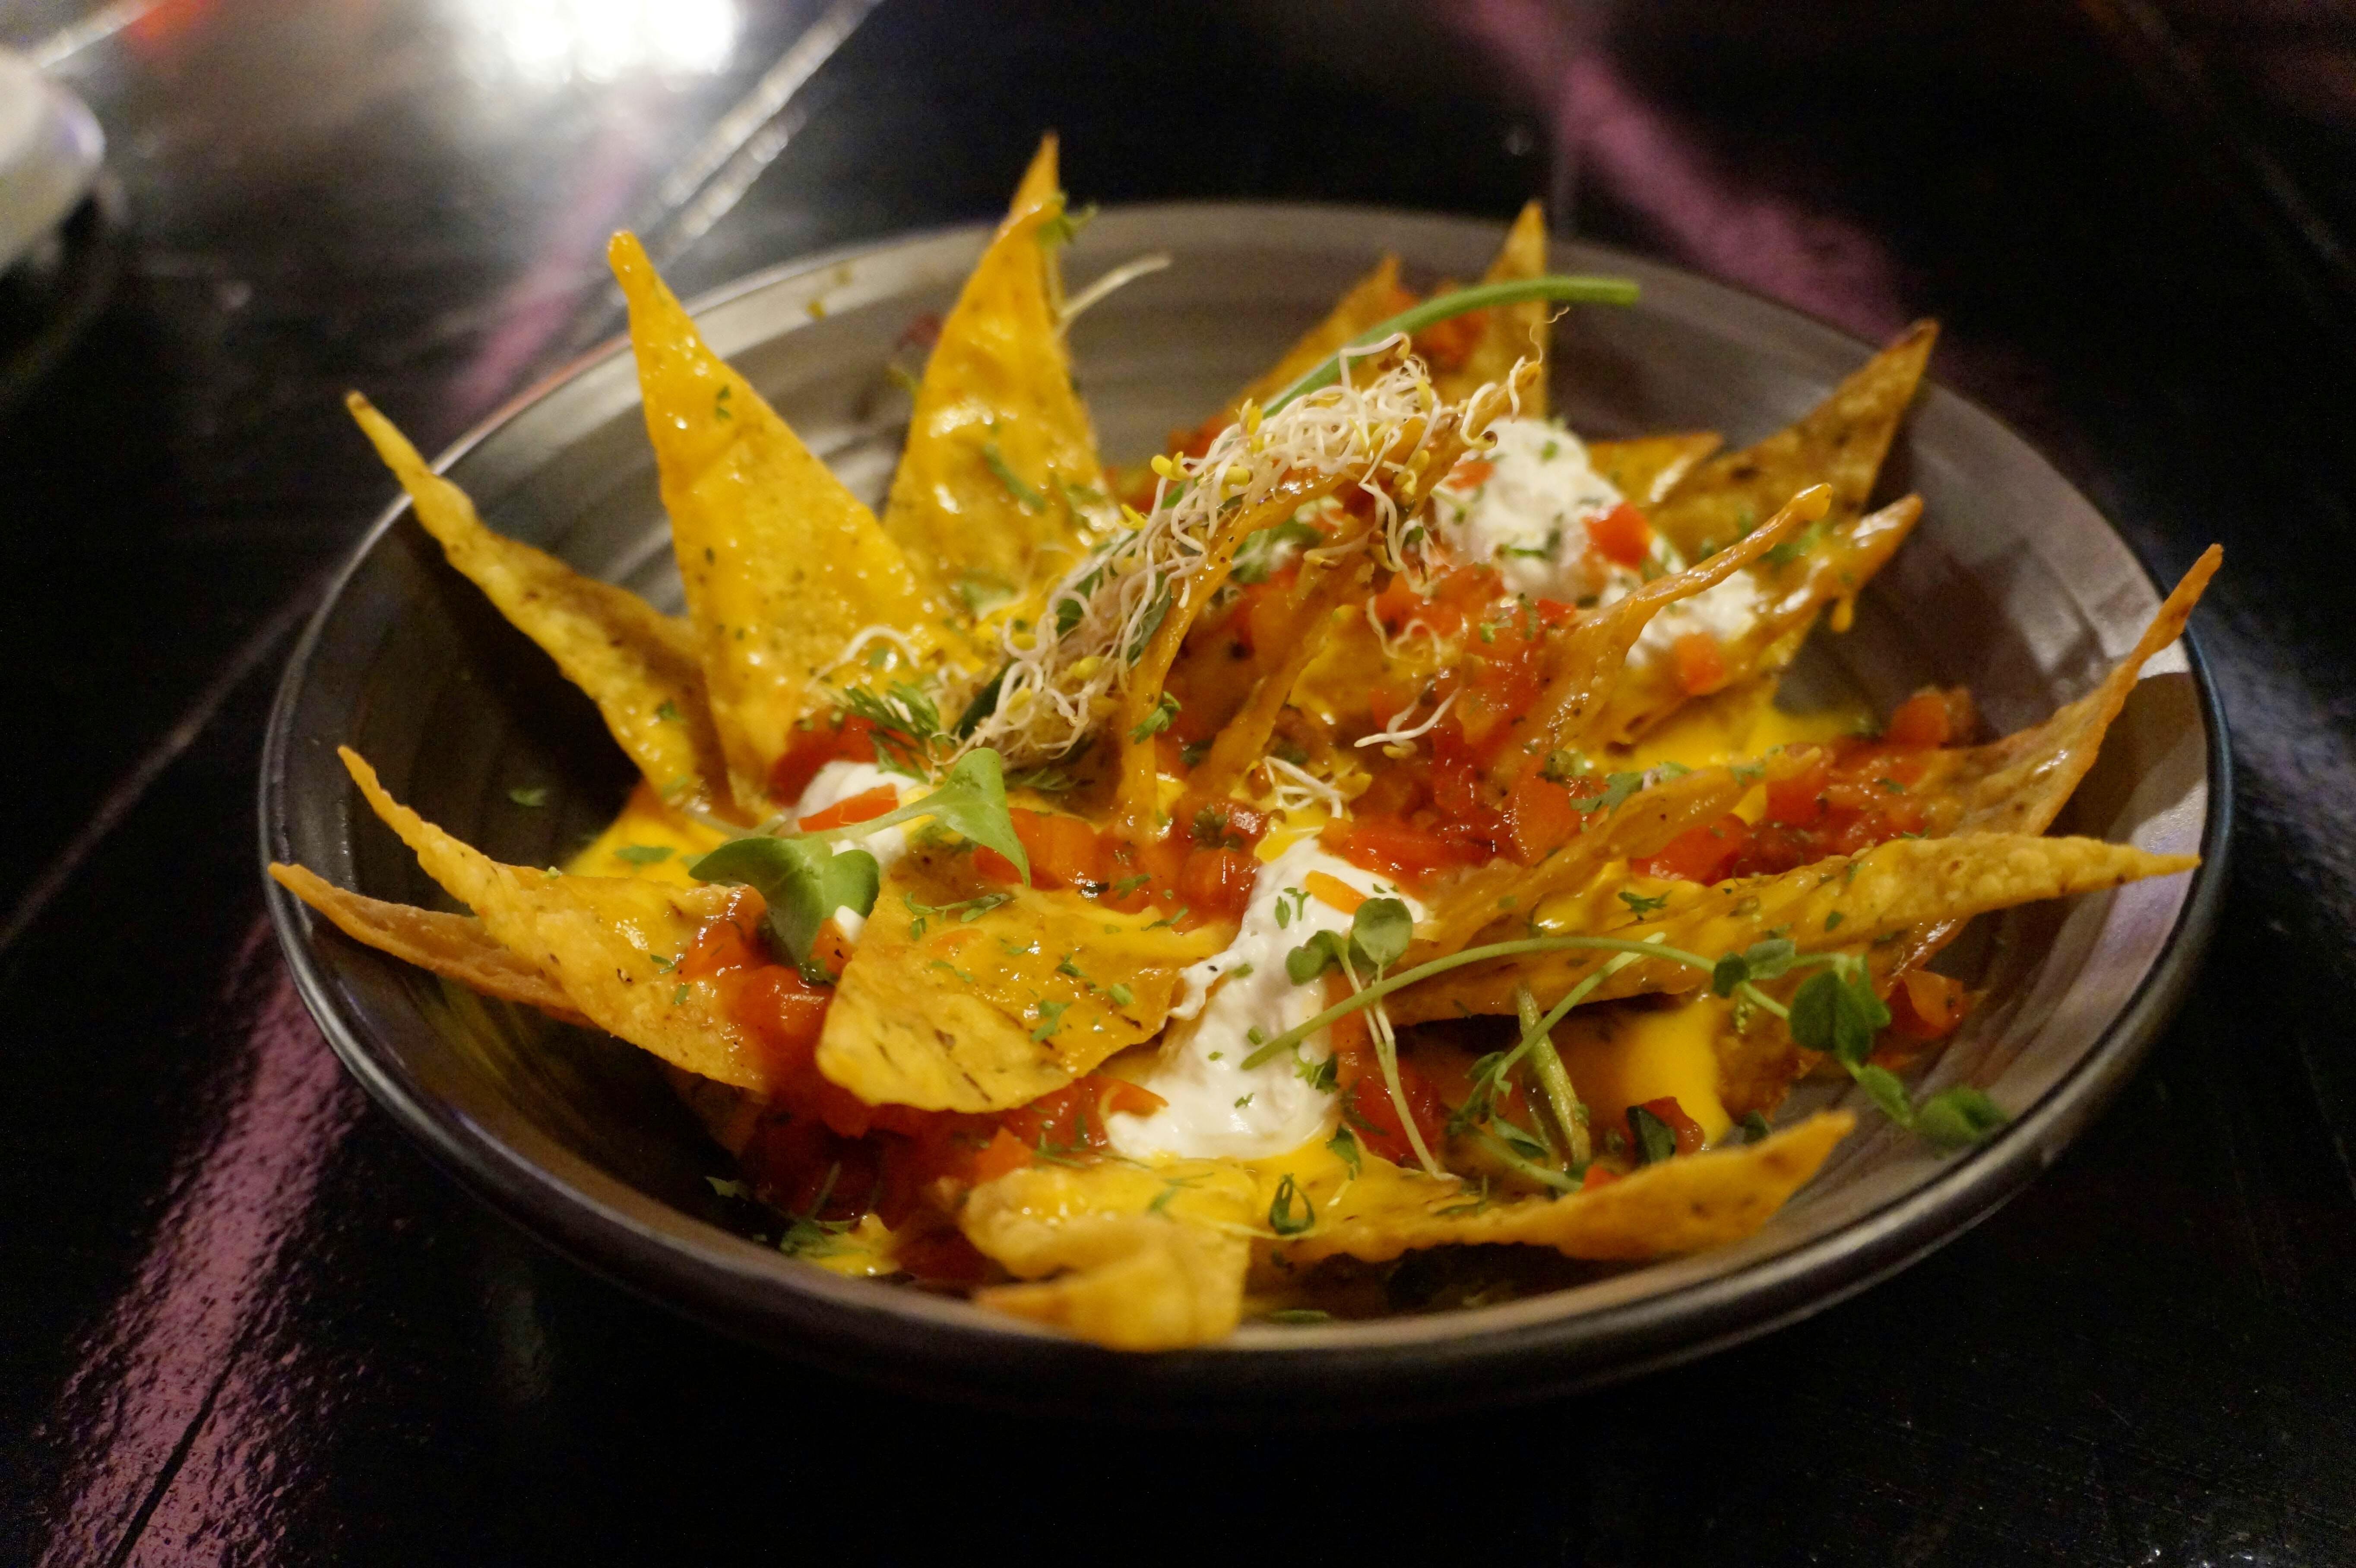 Food,Dish,Cuisine,Nachos,Ingredient,Recipe,Produce,Salad,Side dish